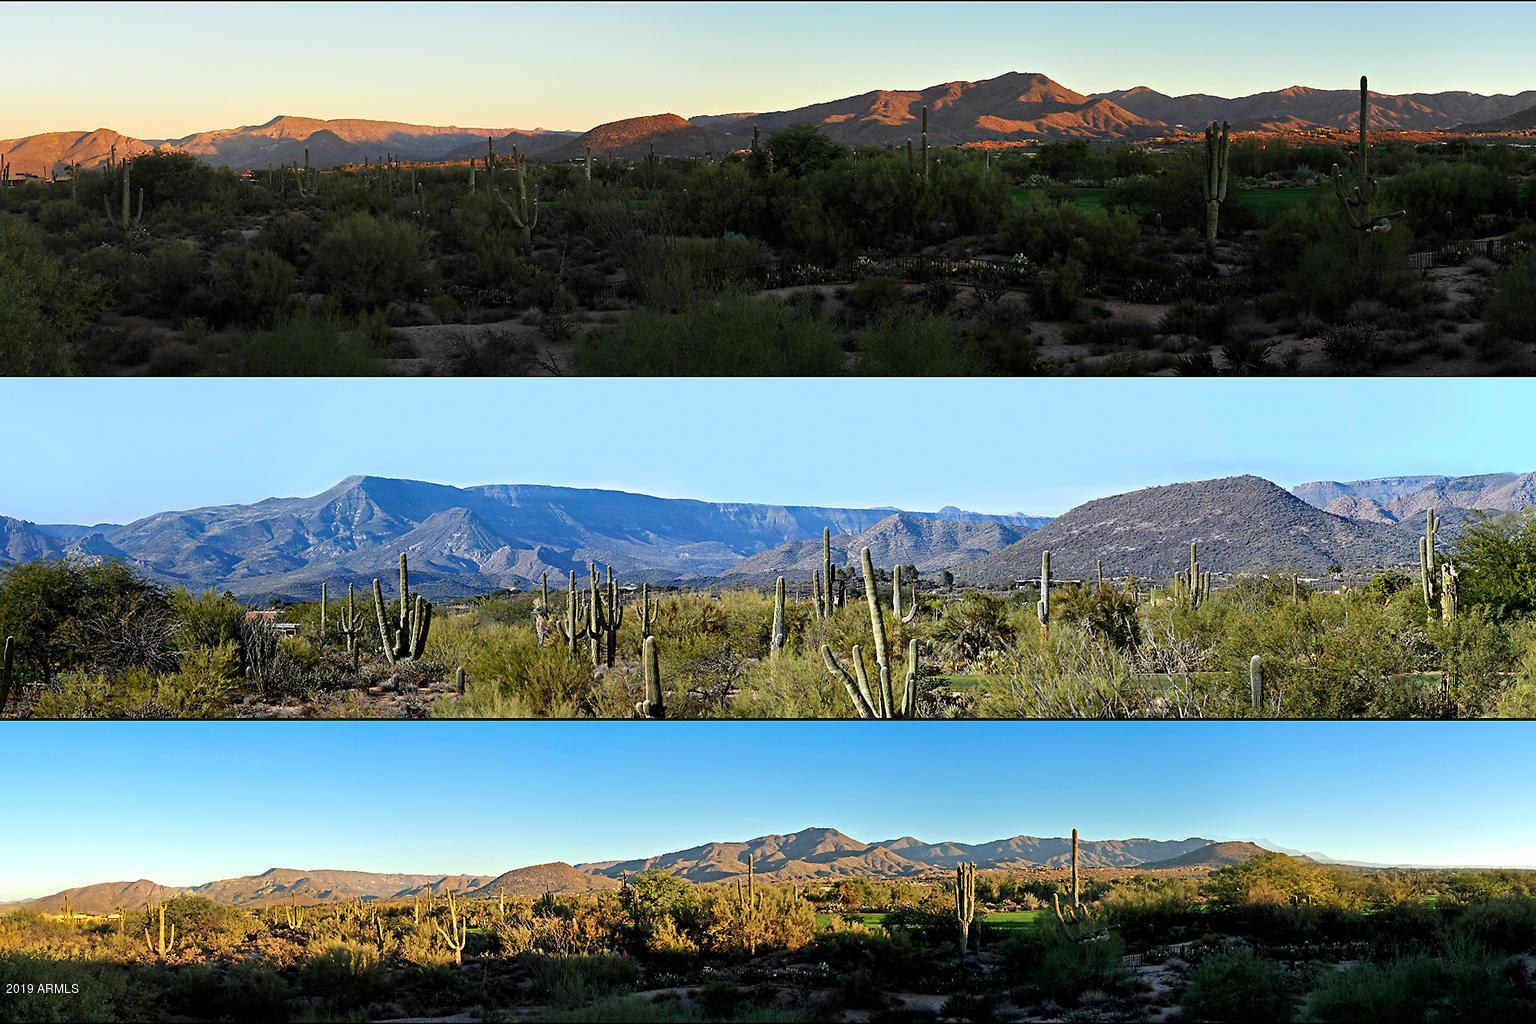 MLS 5952405 36601 N MULE TRAIN Road Unit C15, Carefree, AZ 85377 Carefree AZ Condo or Townhome